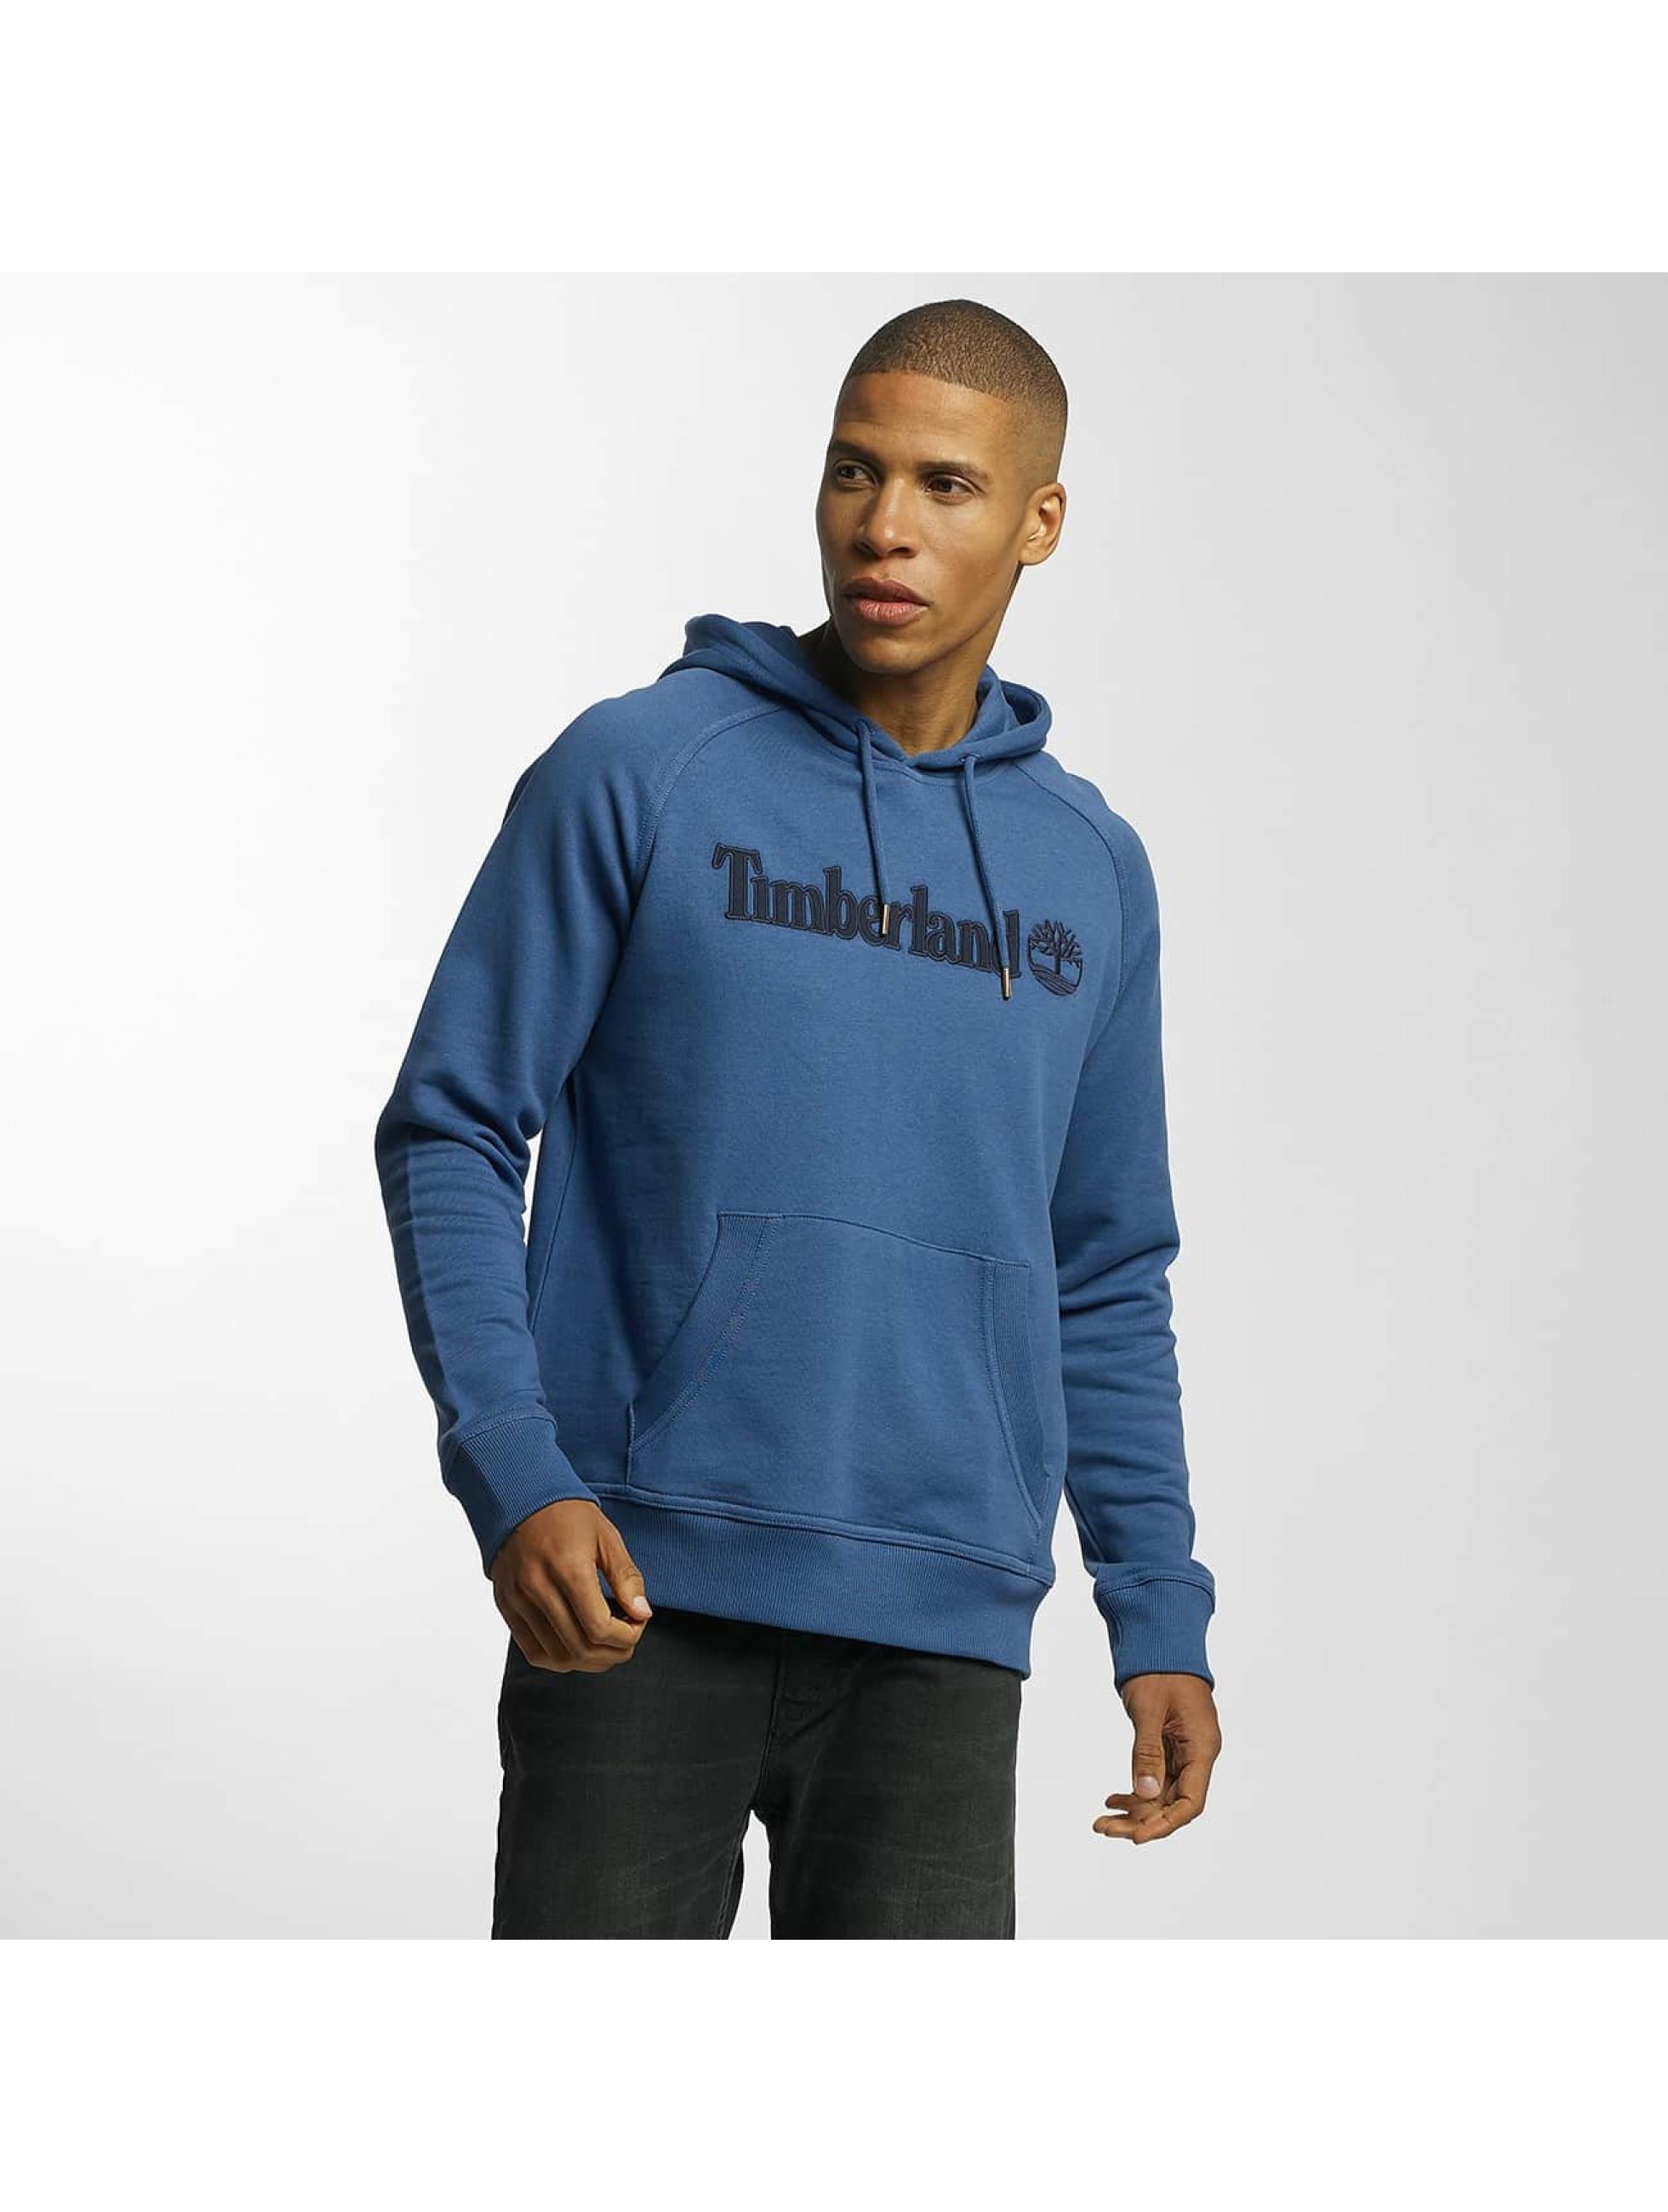 Timberland Hoodies Graph modrý